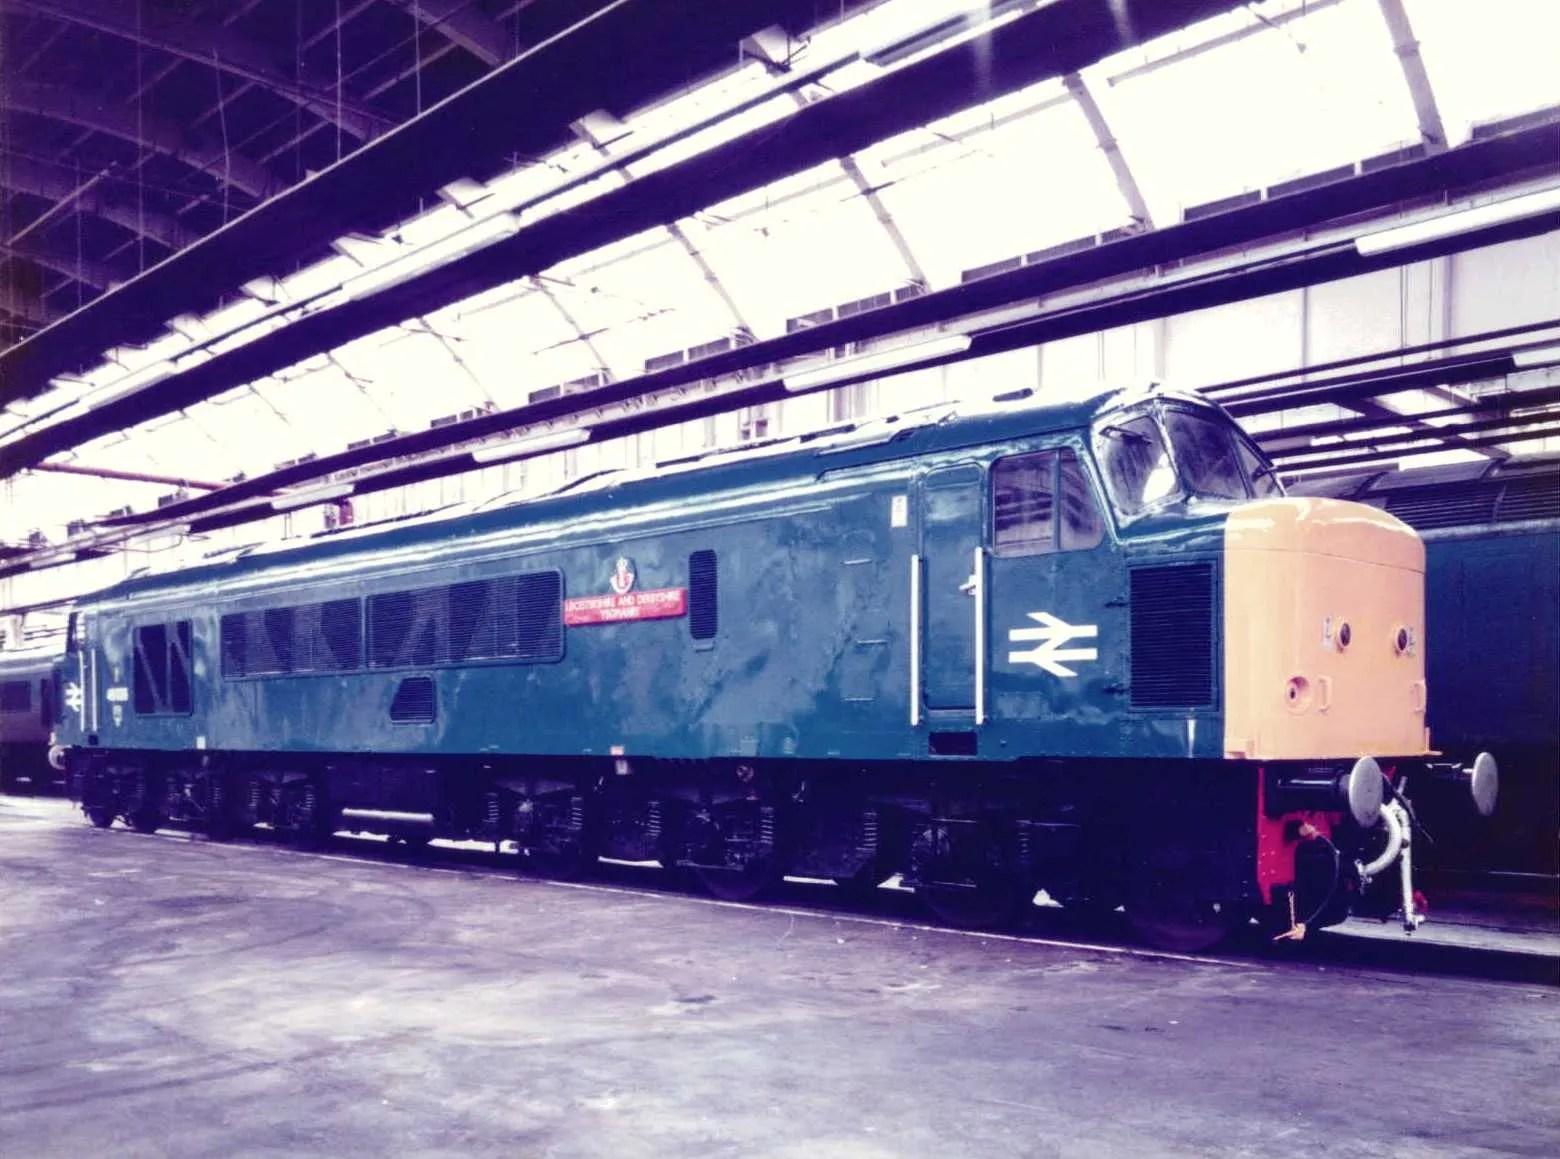 Peak Class 46 diesel locomotive 46026 at Gateshead depot